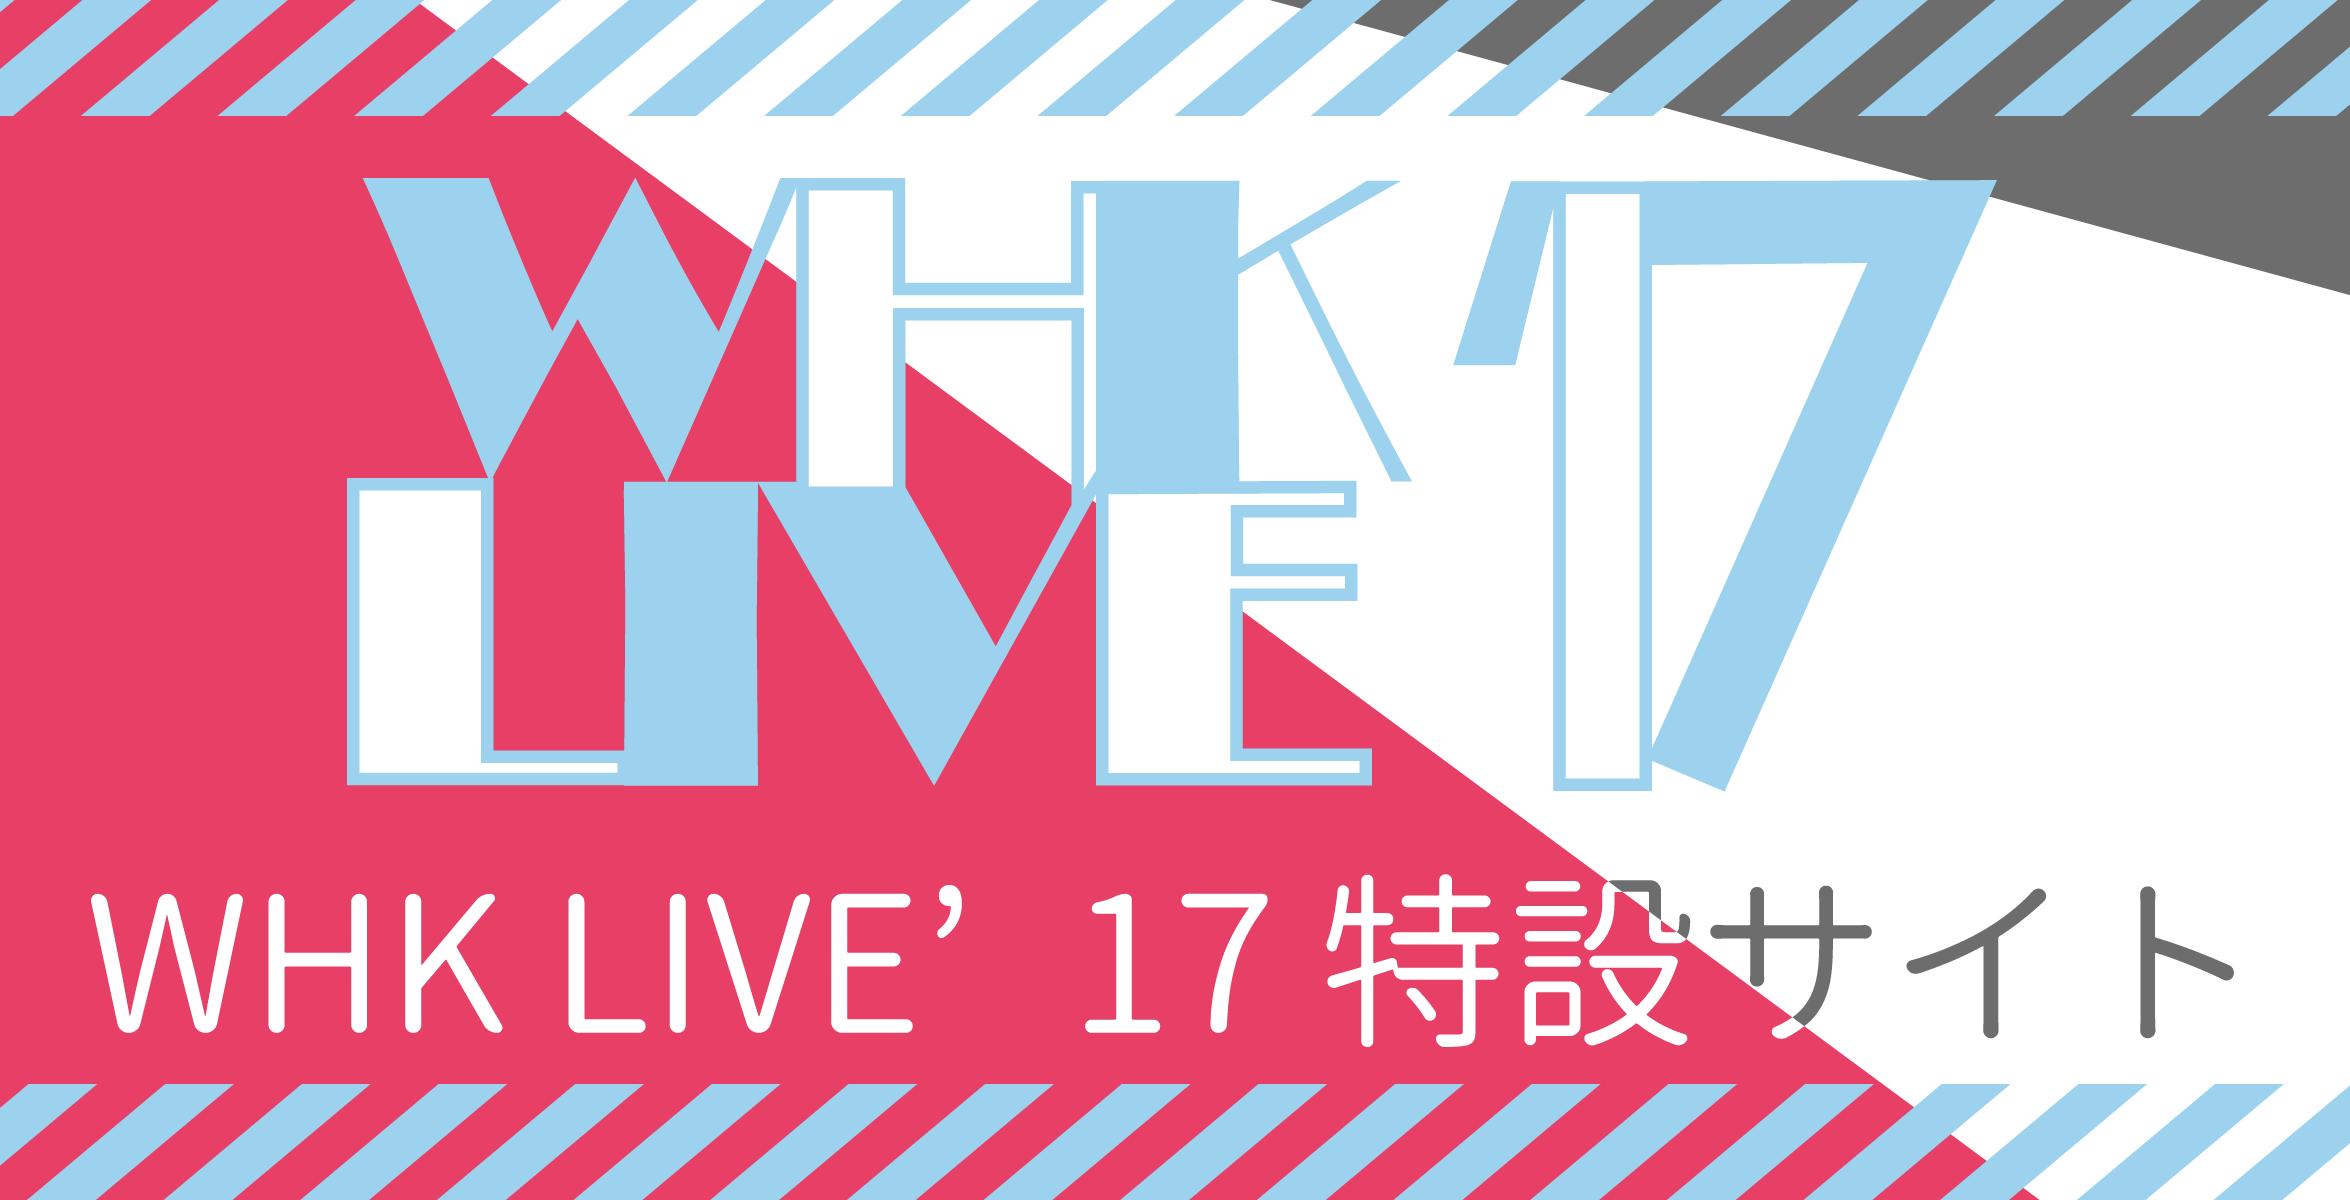 WHK LIVE'17 特設サイト